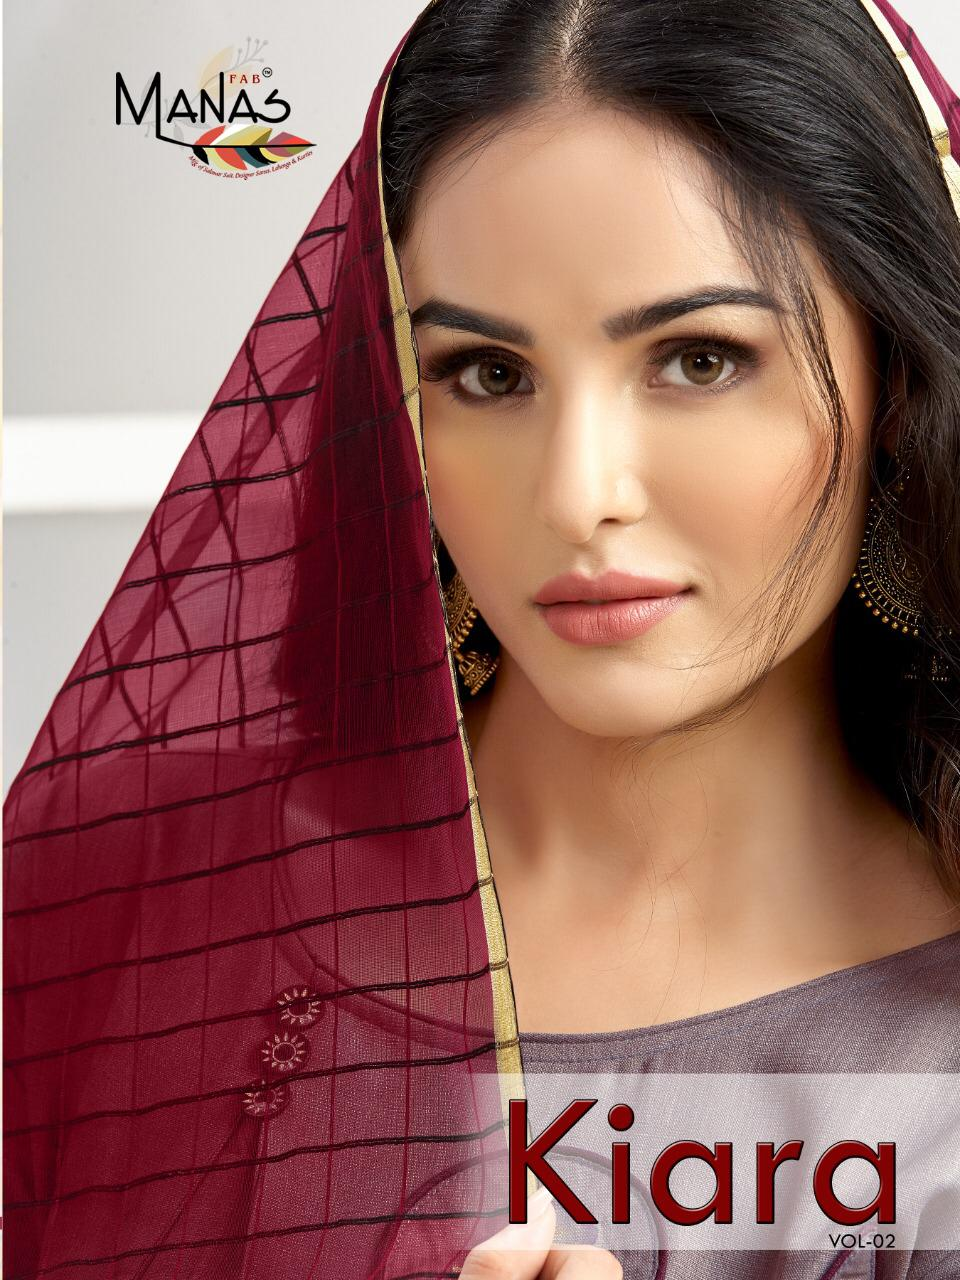 Manas Kiara Vol 2 Long Gown With Banarasi Dupatta Ethnic Collection